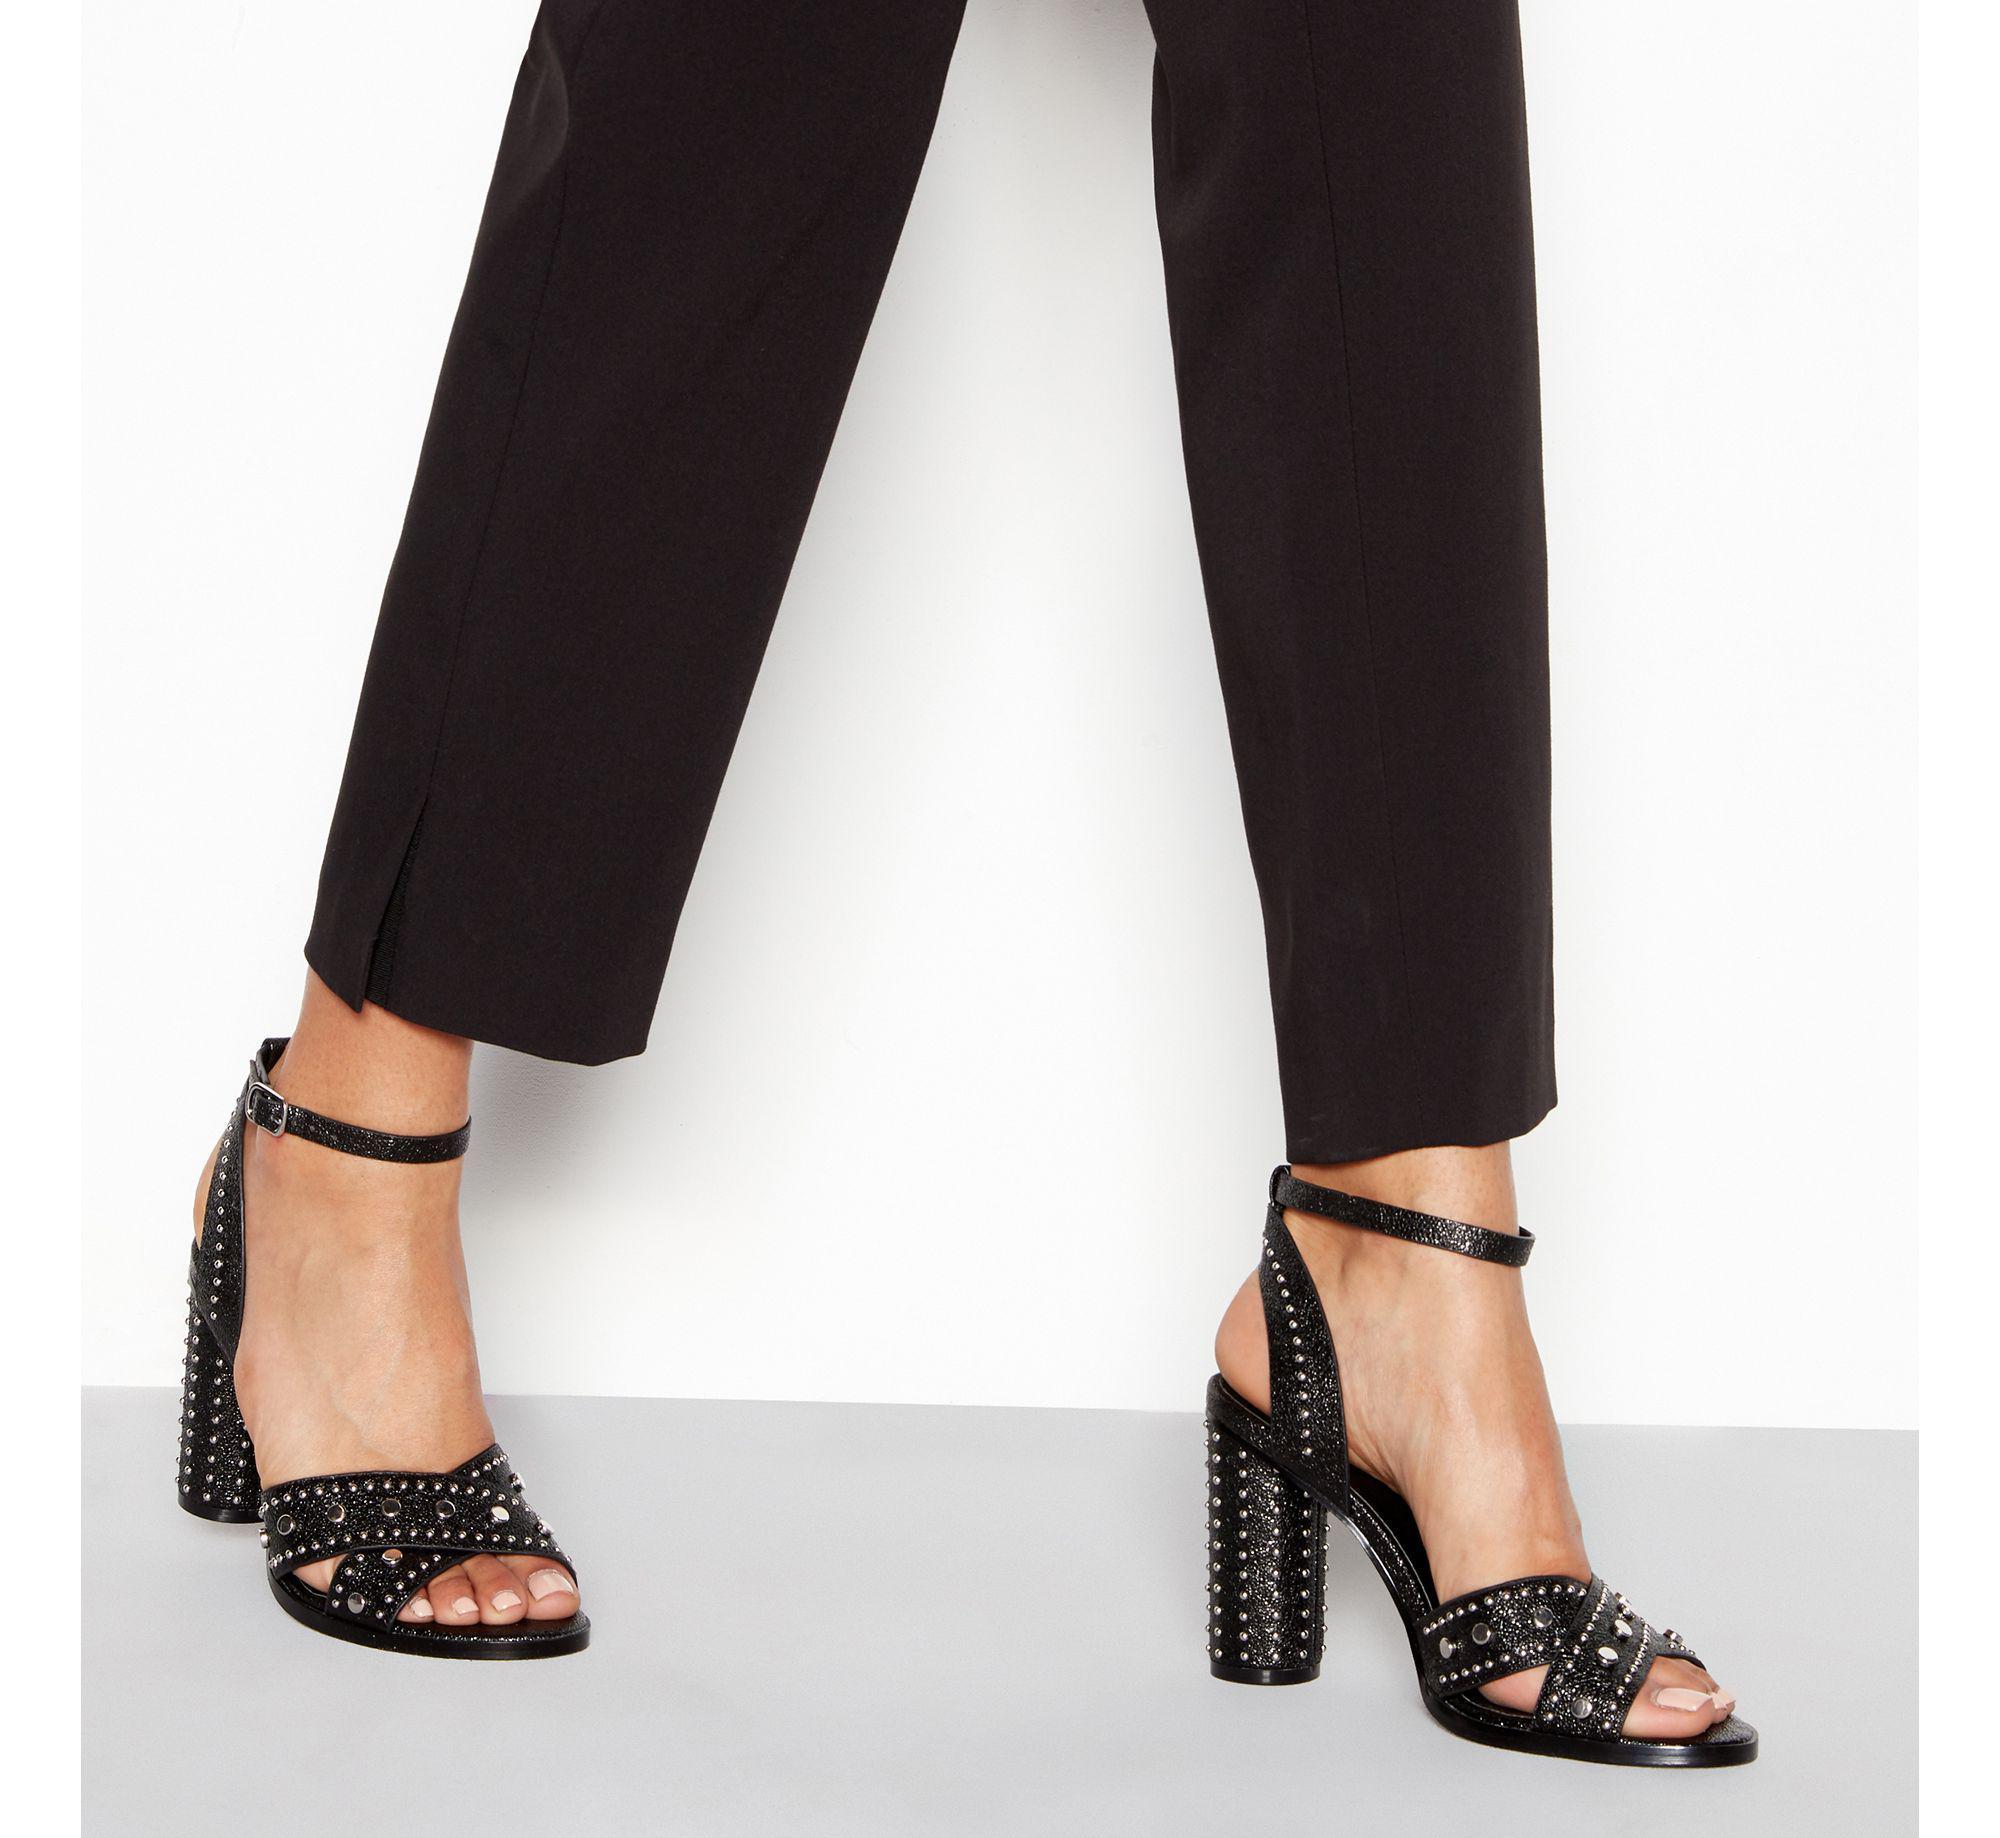 3d8ffb03c6e Faith Black Stud  lynx  High Block Heel Ankle Strap Sandals in Black ...